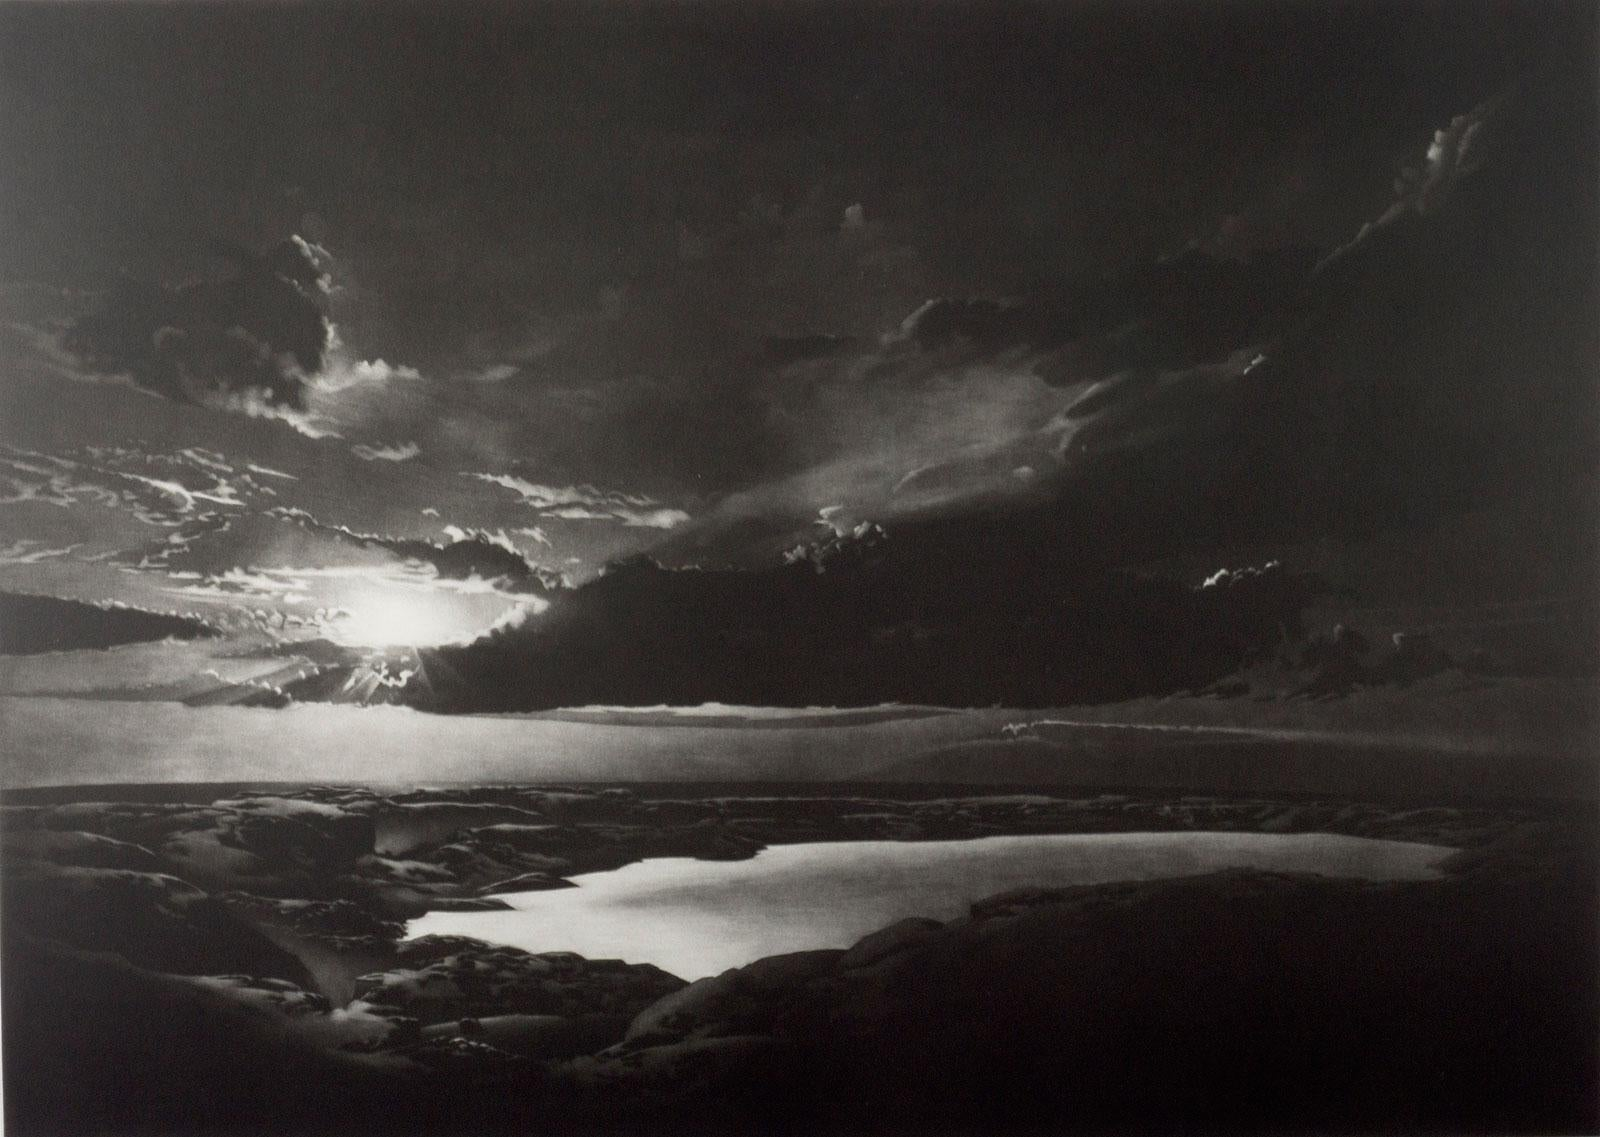 Icelandic Landscape (The sun creates dramatic cloud pattern over a glacial lake)